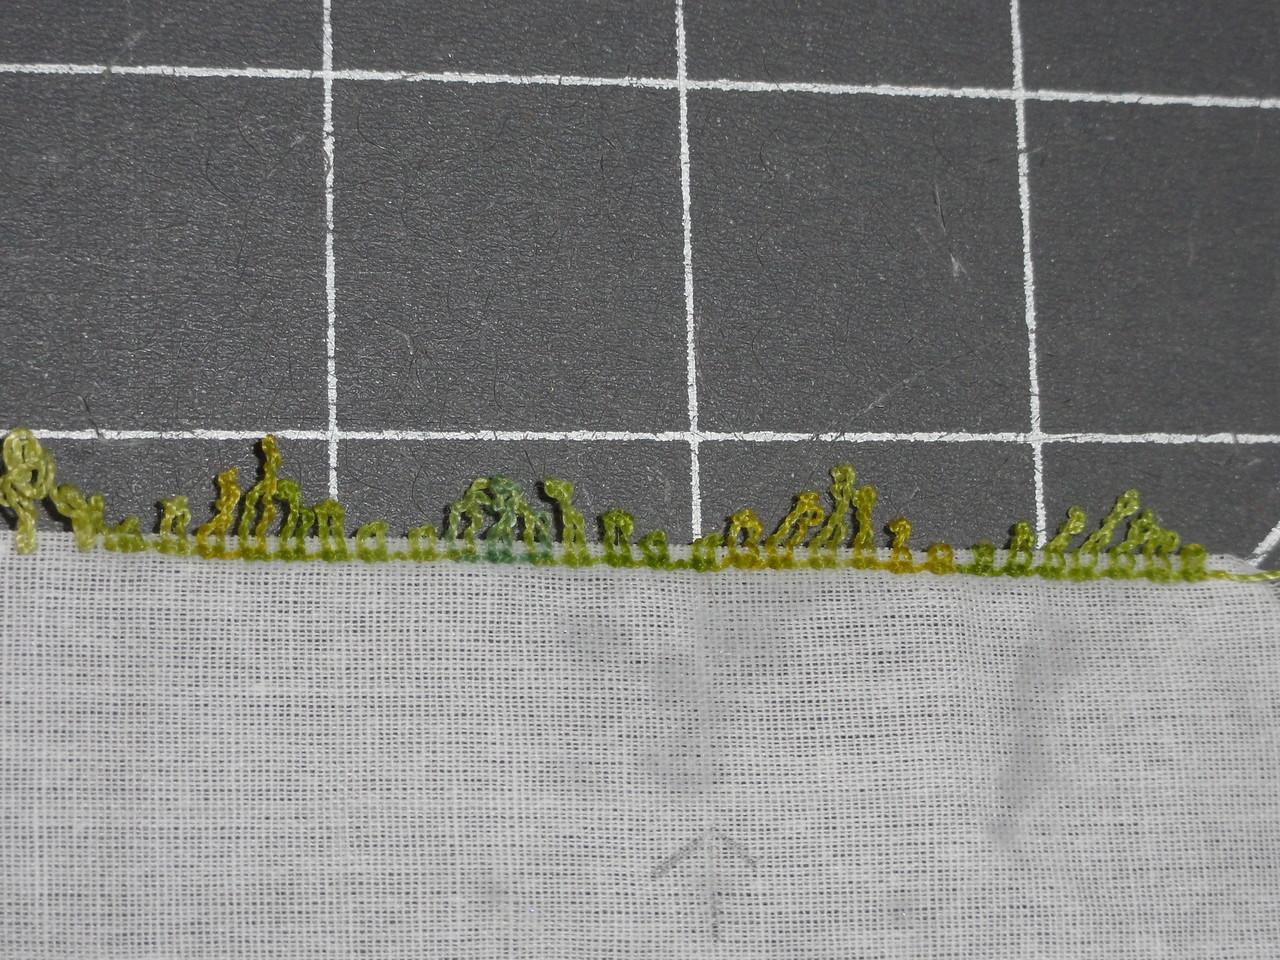 Stitch 631 on Bernina 830